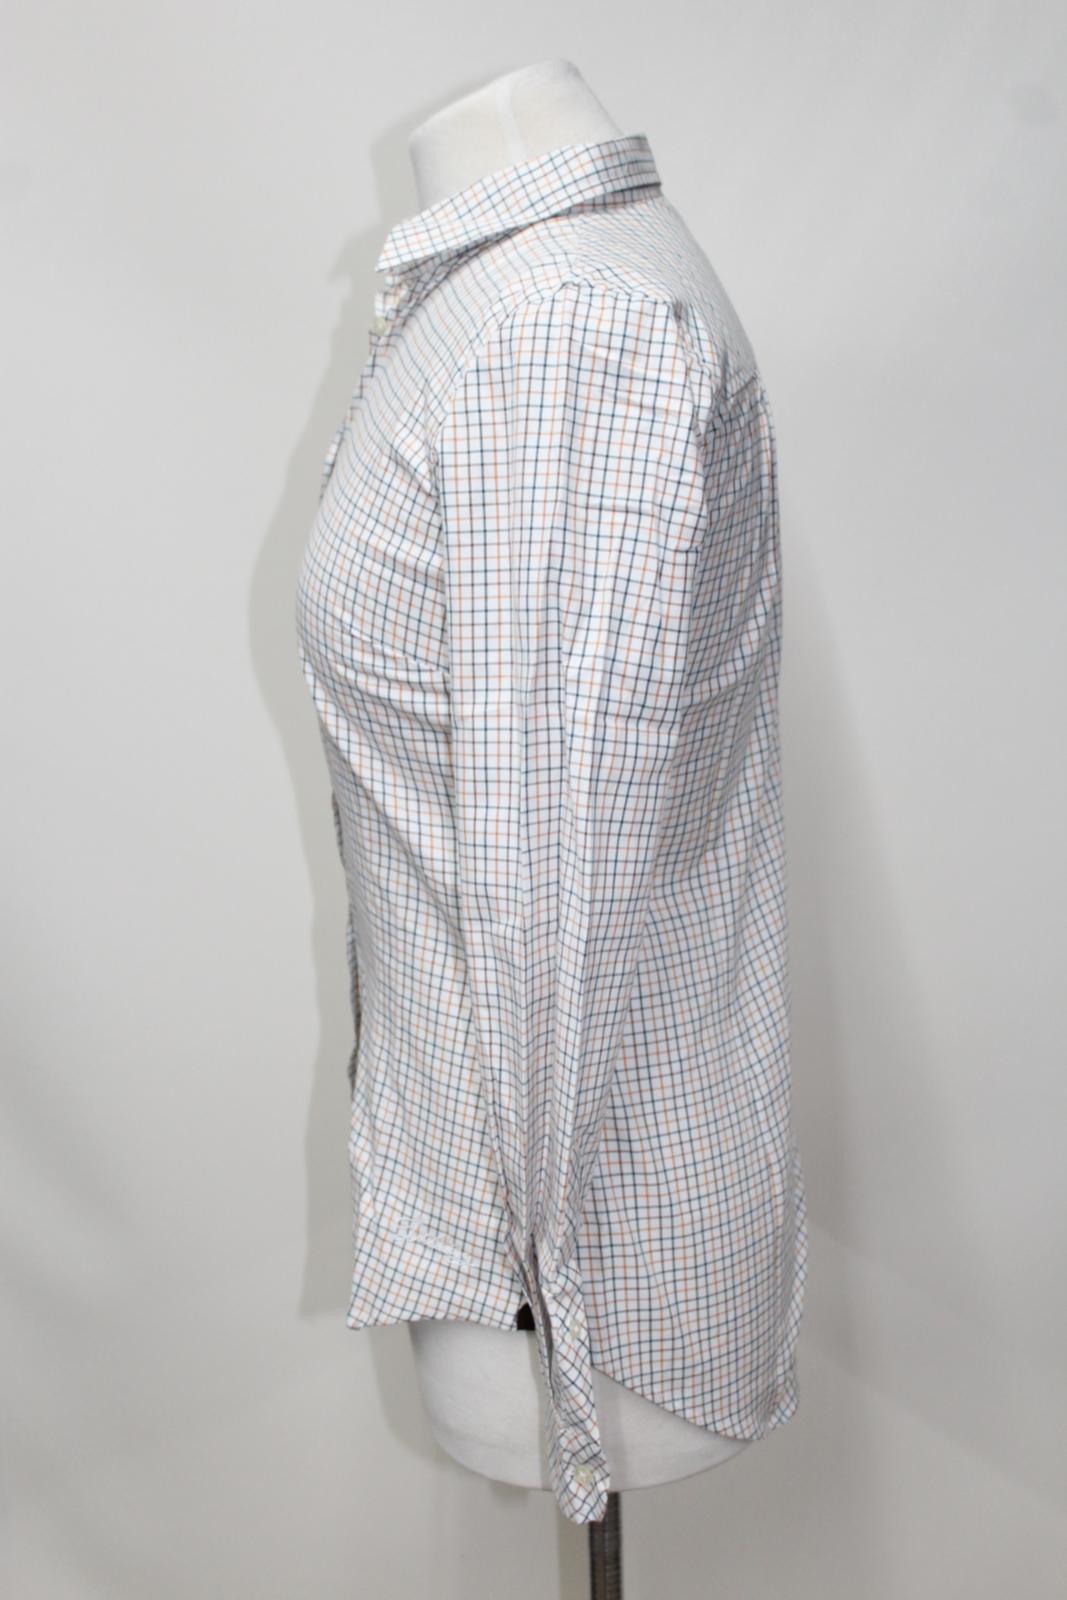 Long Ladies Dubarry White Bnwt Cotton Eu34 Sleeve Elderflower Shirt Check Uk8 gCwa7